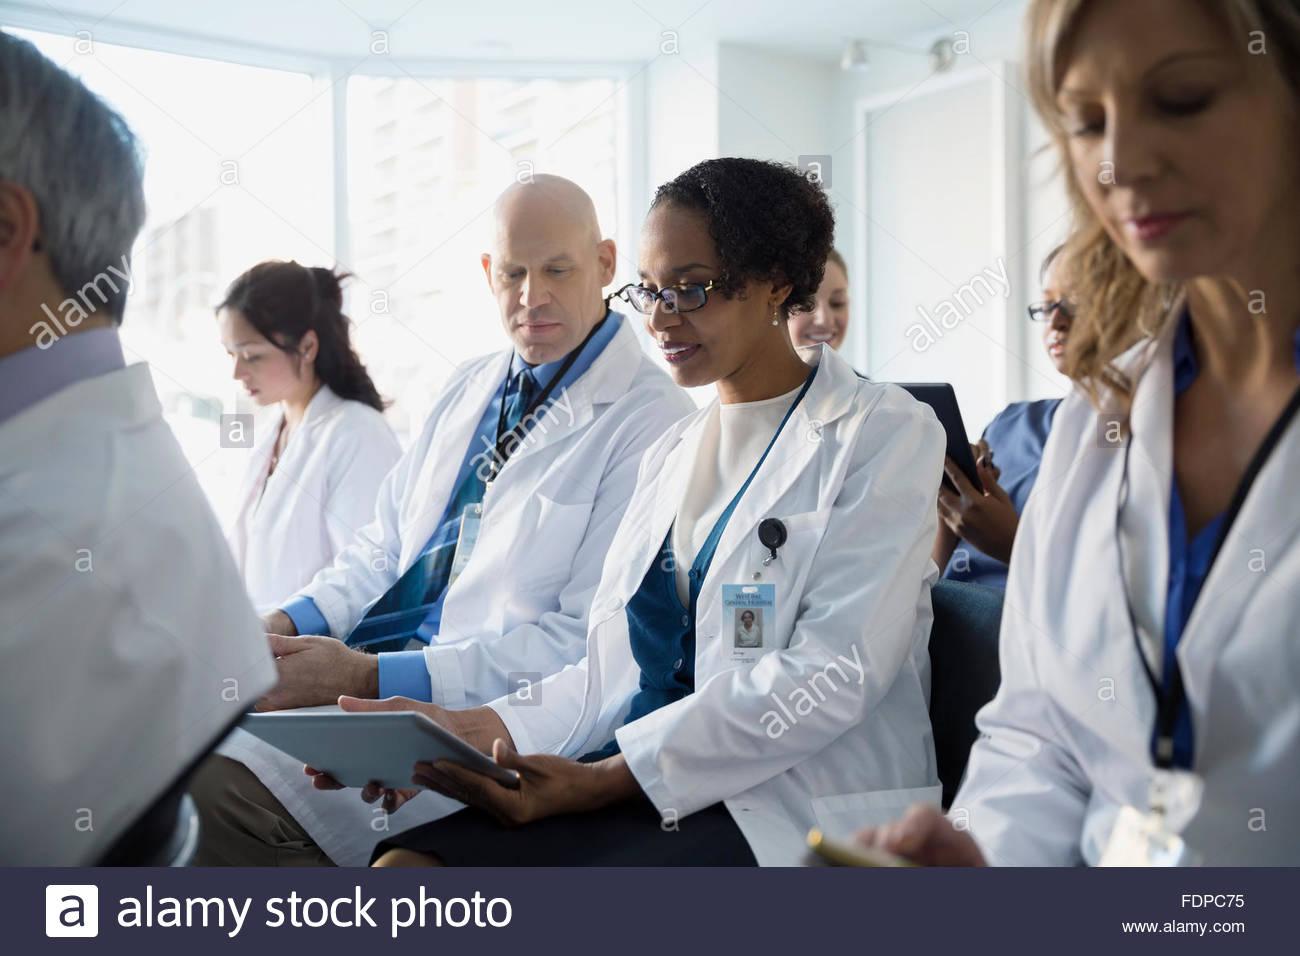 Doctors using digital tablet in seminar audience - Stock Image